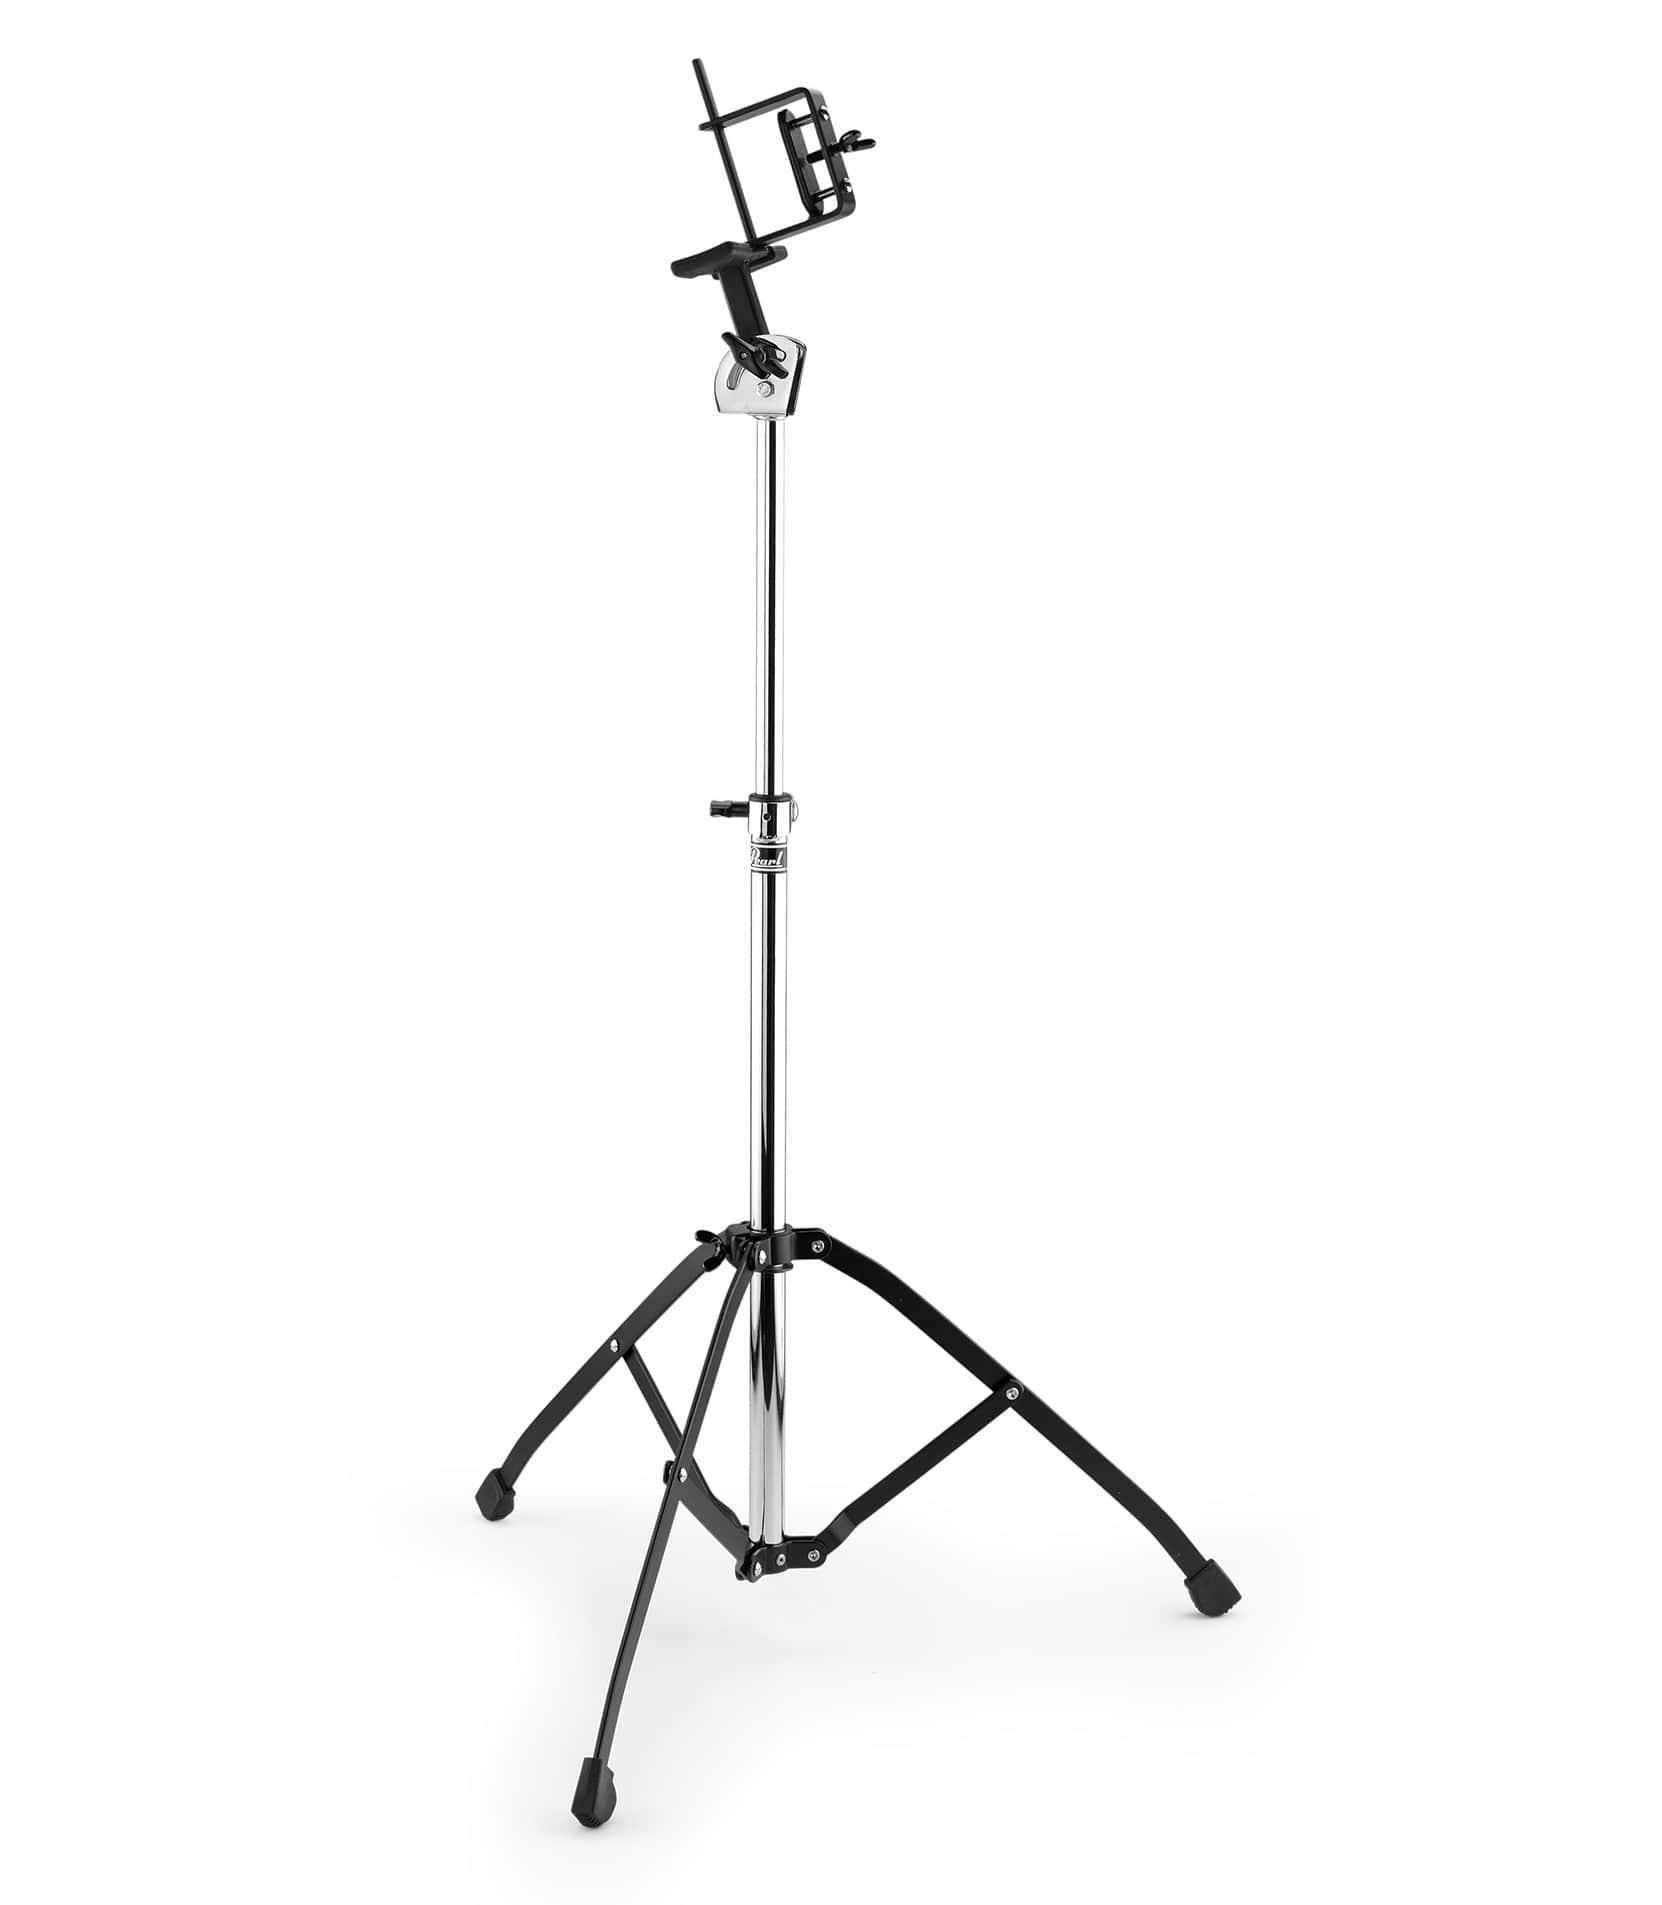 buy pearl pb 700 light weight bongo stand